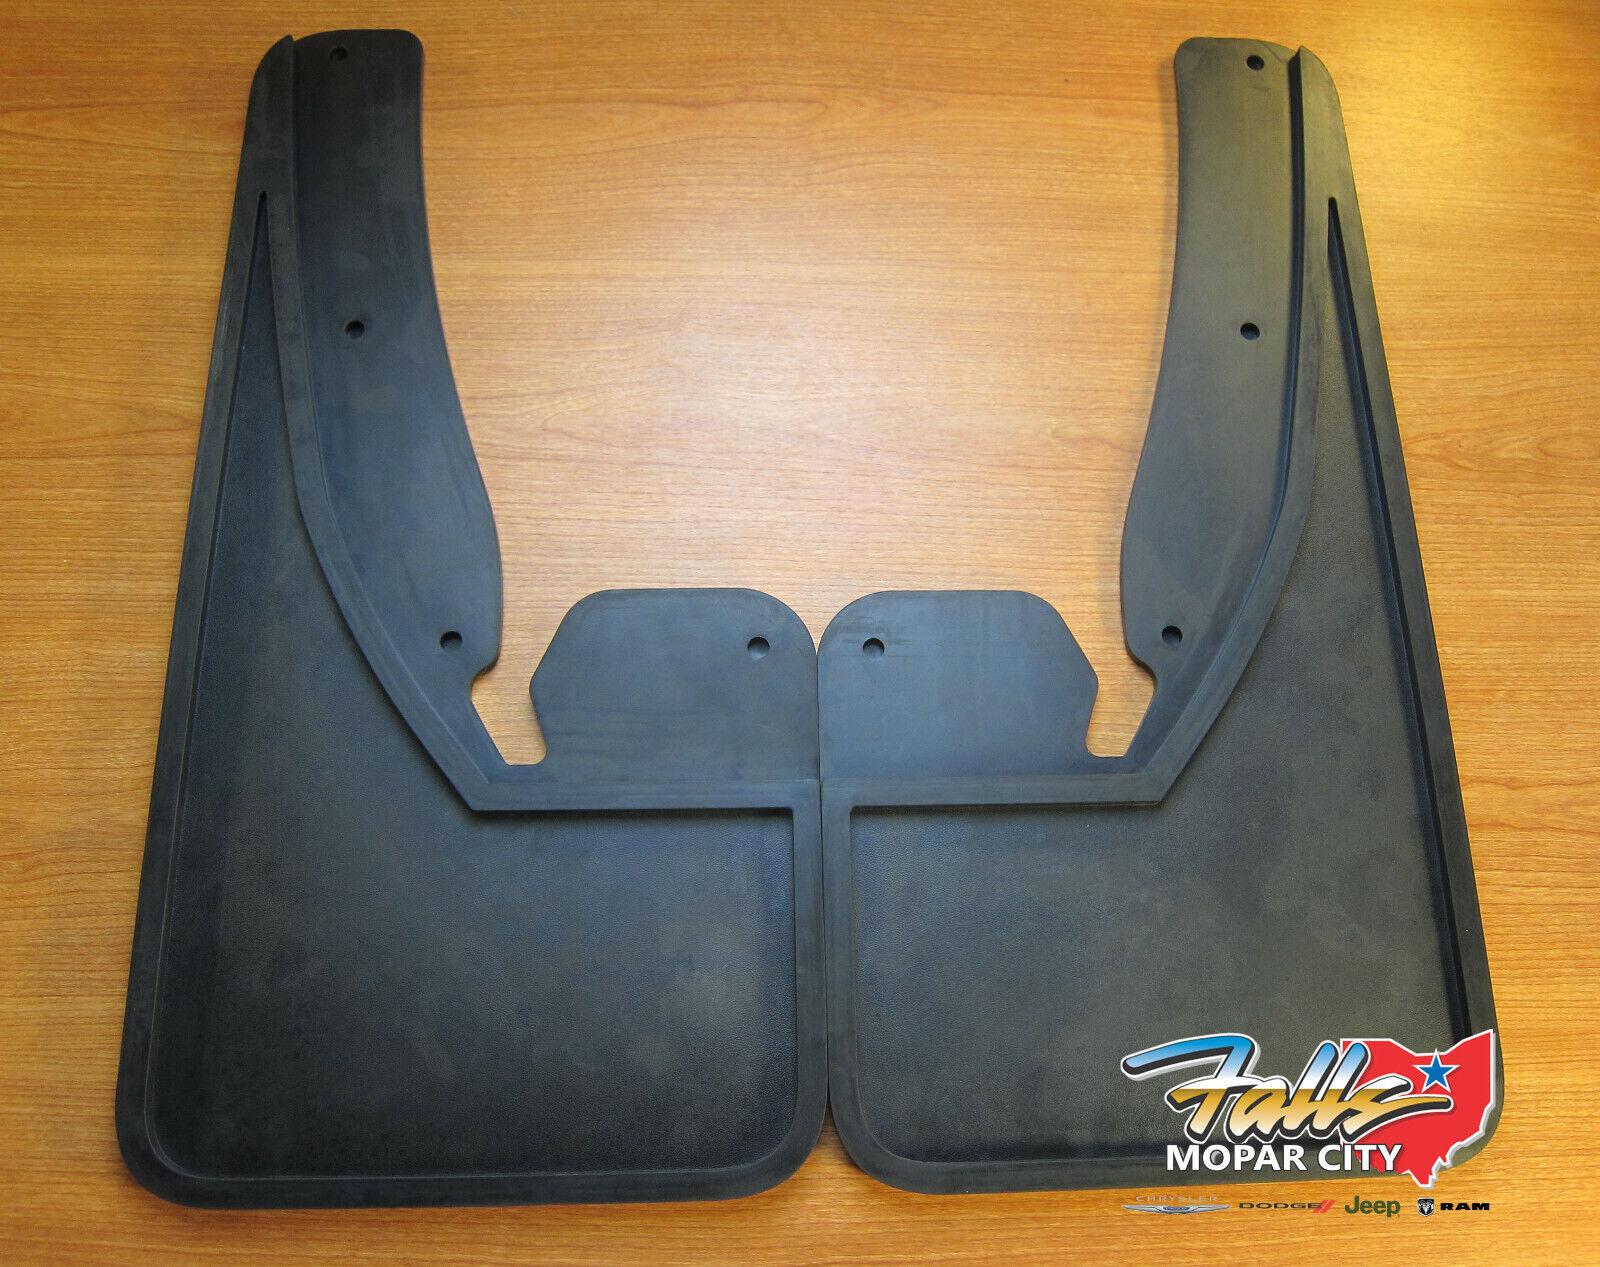 Mopar 2009-2018 Dodge Journey Front Splashguards Black New!!!